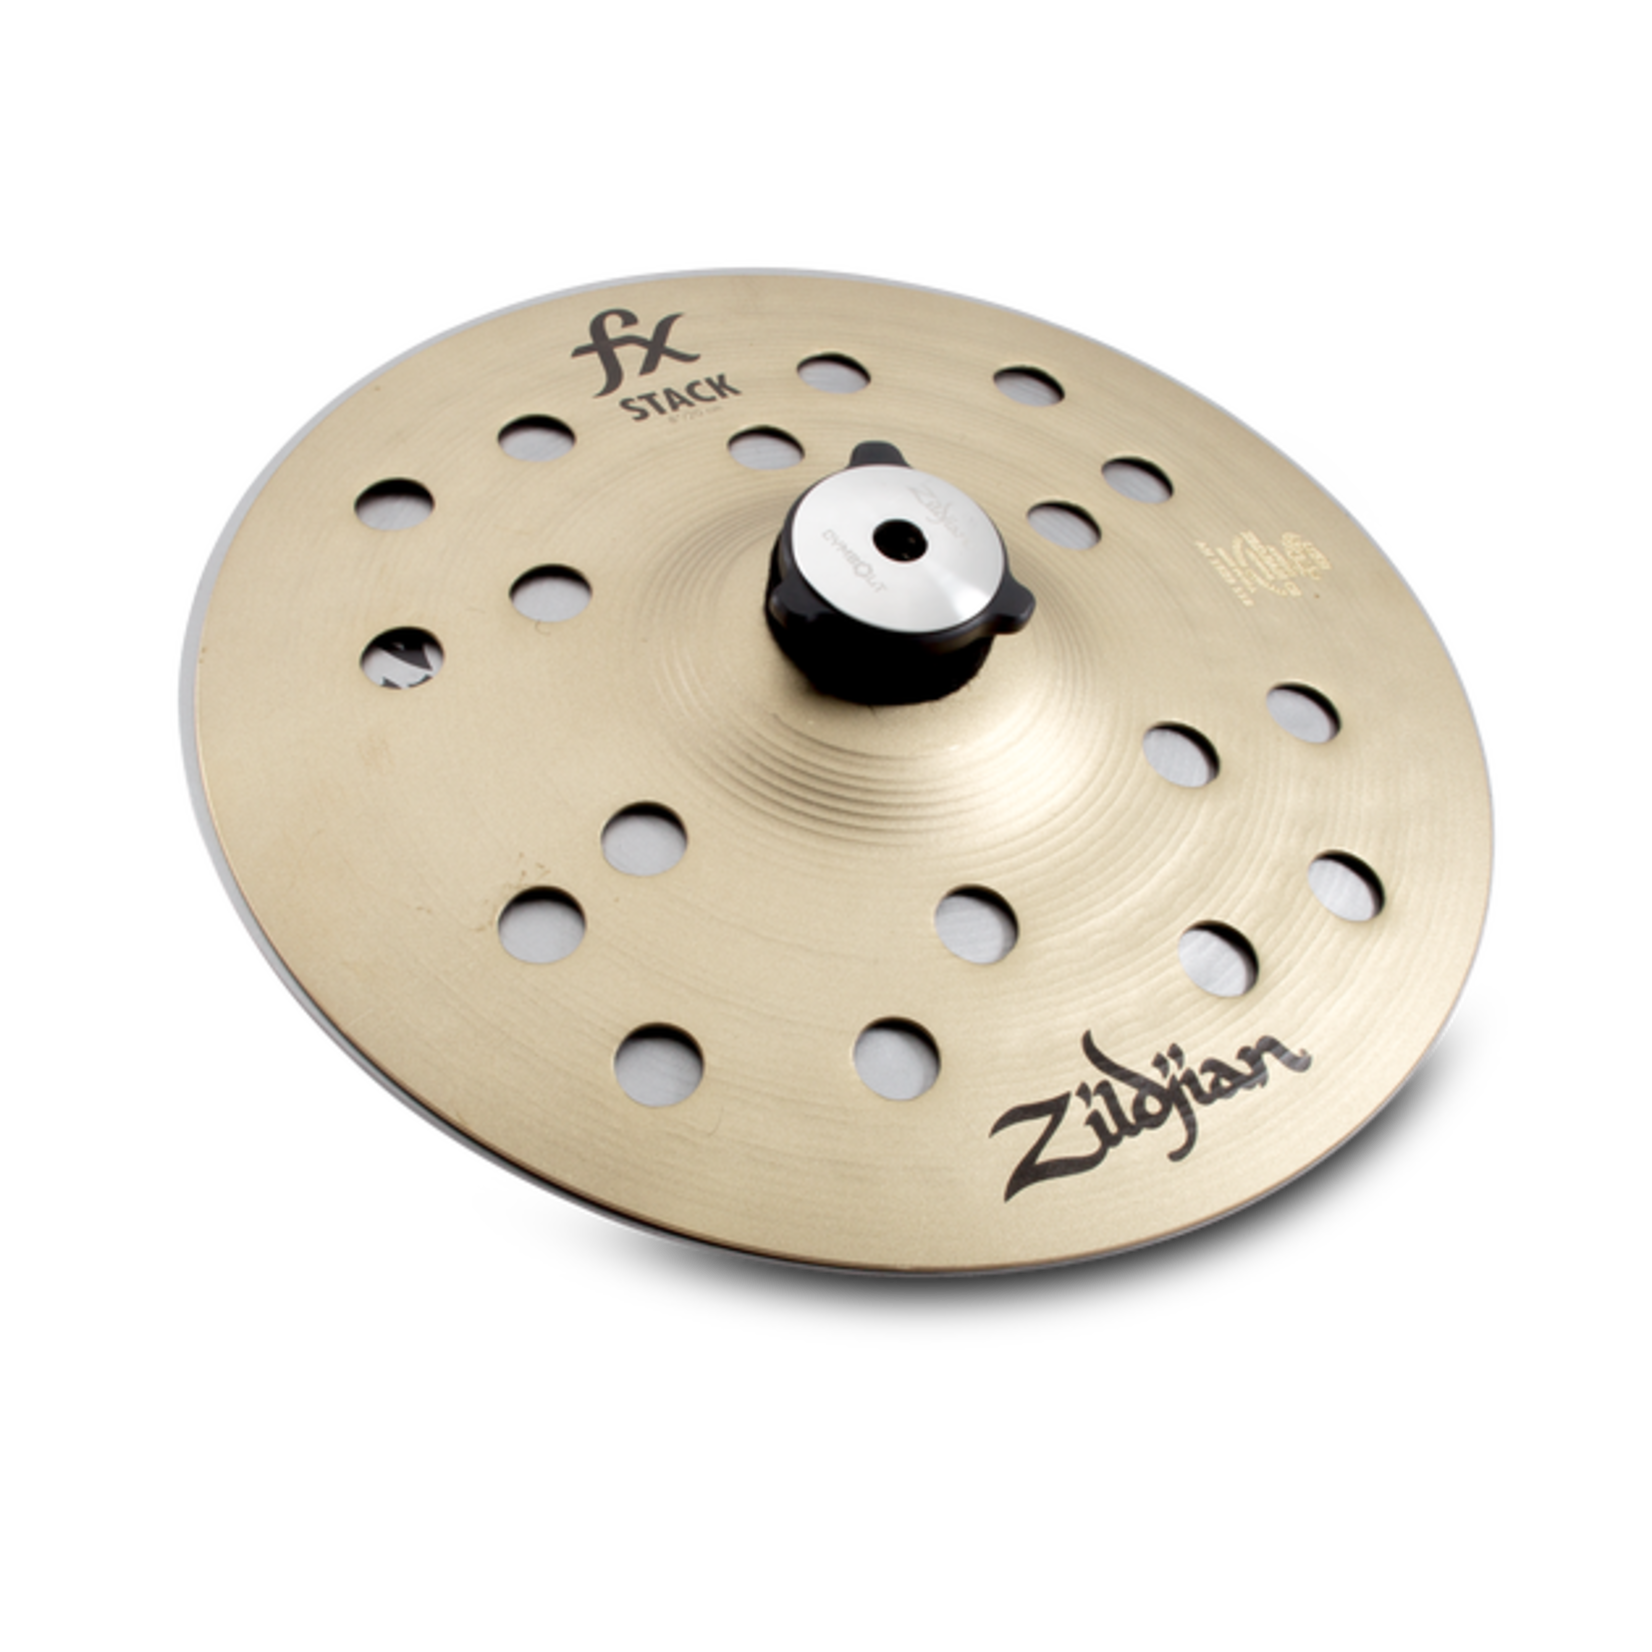 "Zildjian Zildjian 16"" FX Stack Pair w/Mount"